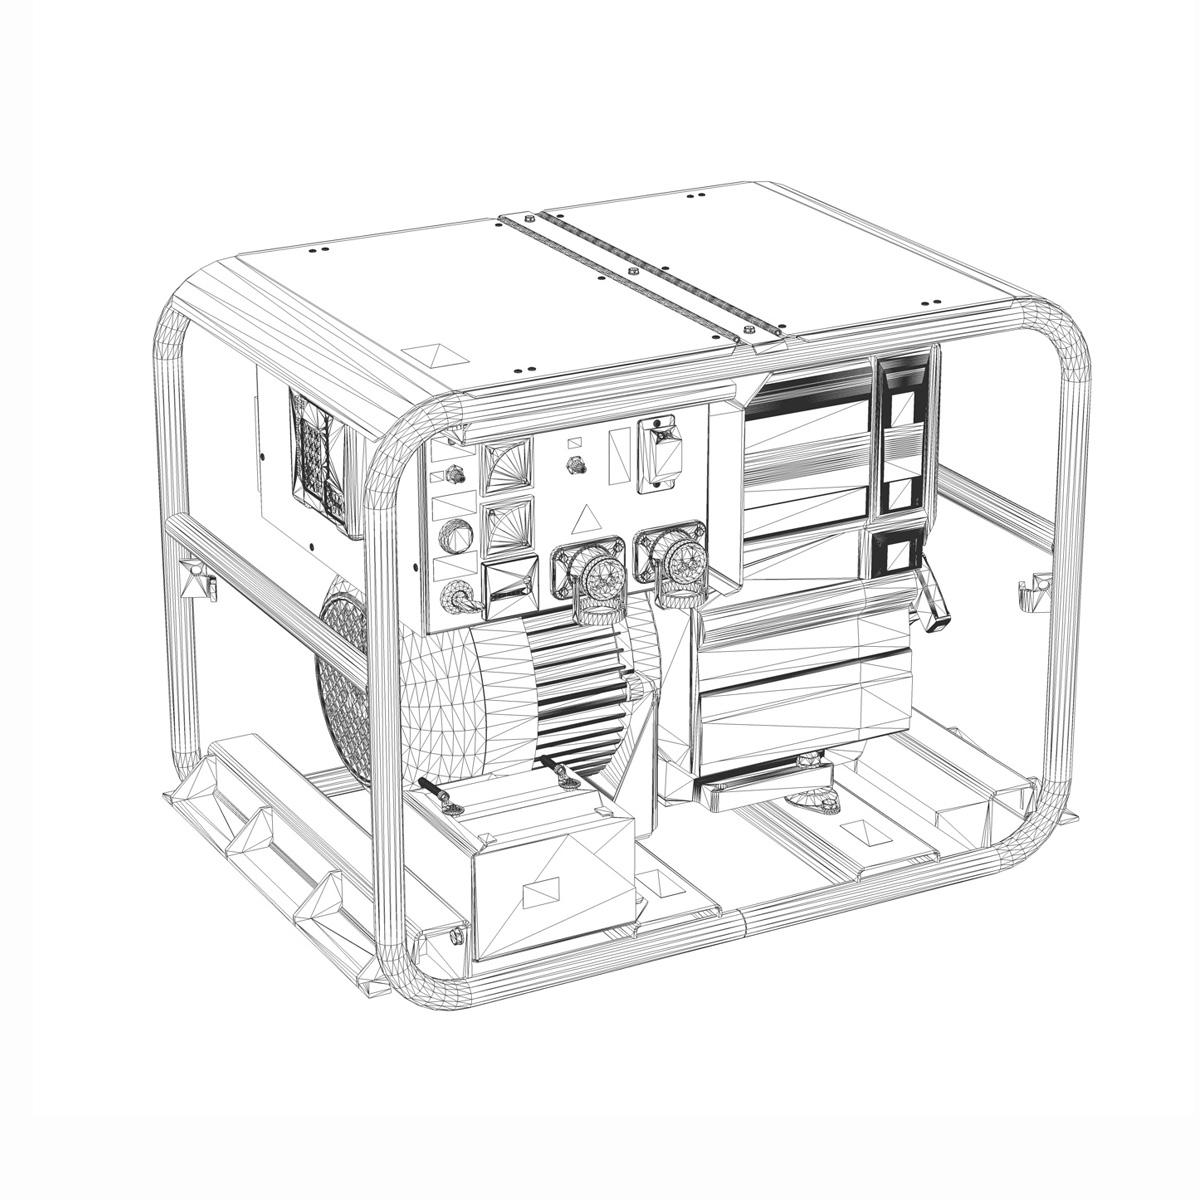 diesel generator 3d model 3ds fbx c4d lwo obj 188594